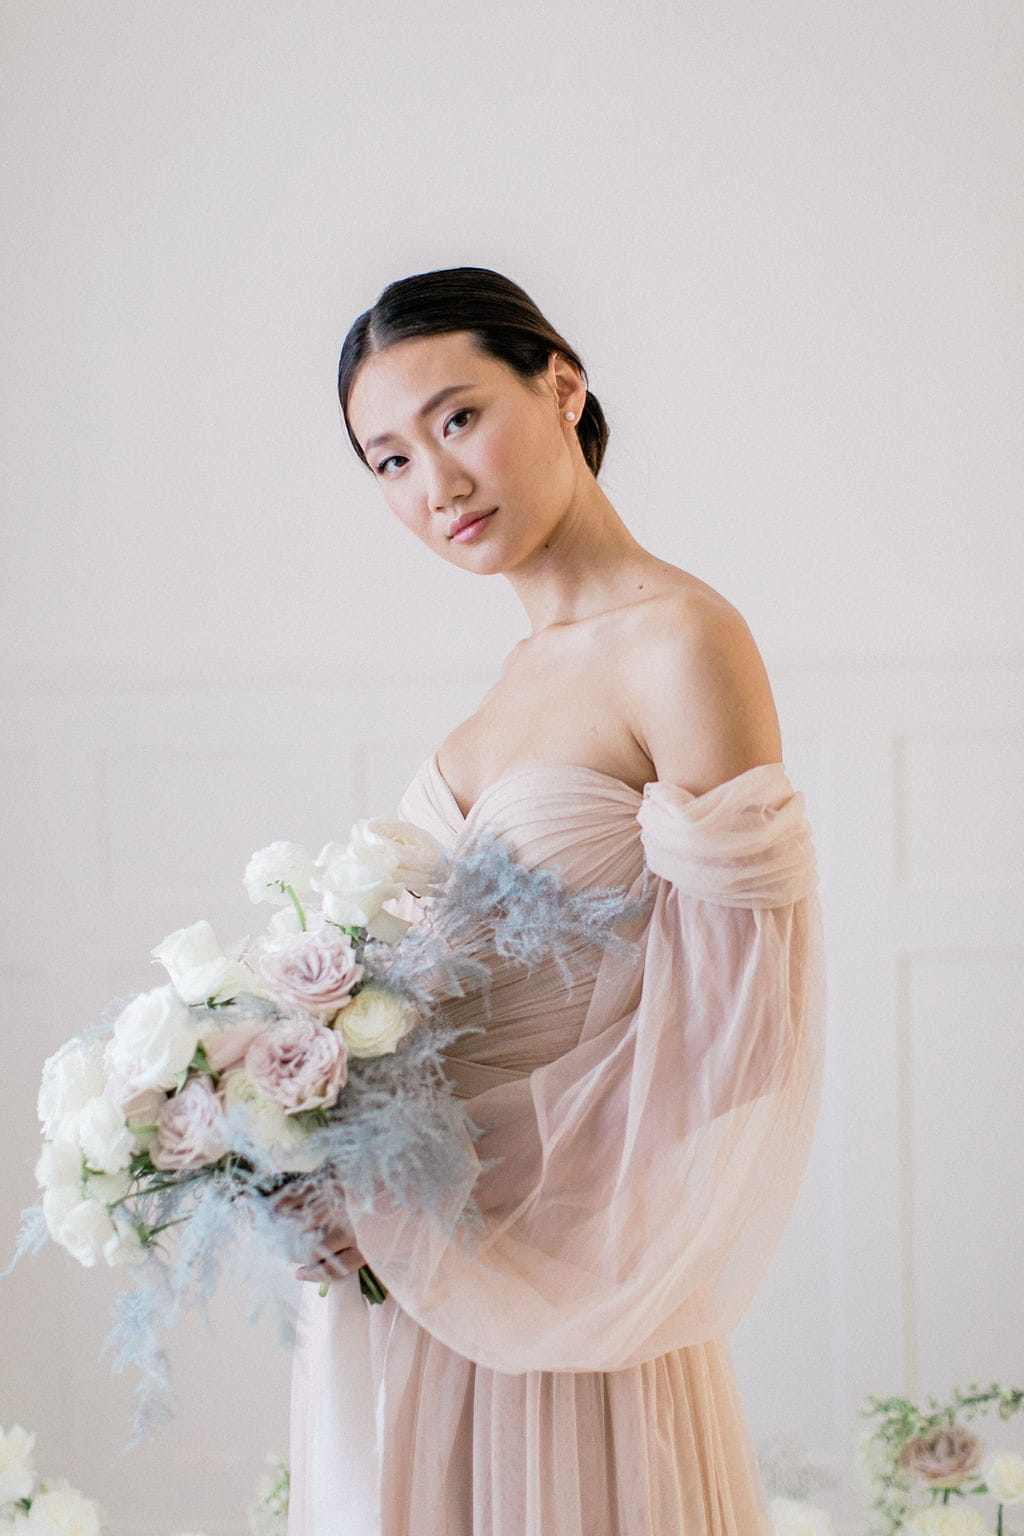 Capucine Atelier Floral - Fleuriste mariage - Floral Designer - Mariage en Provence